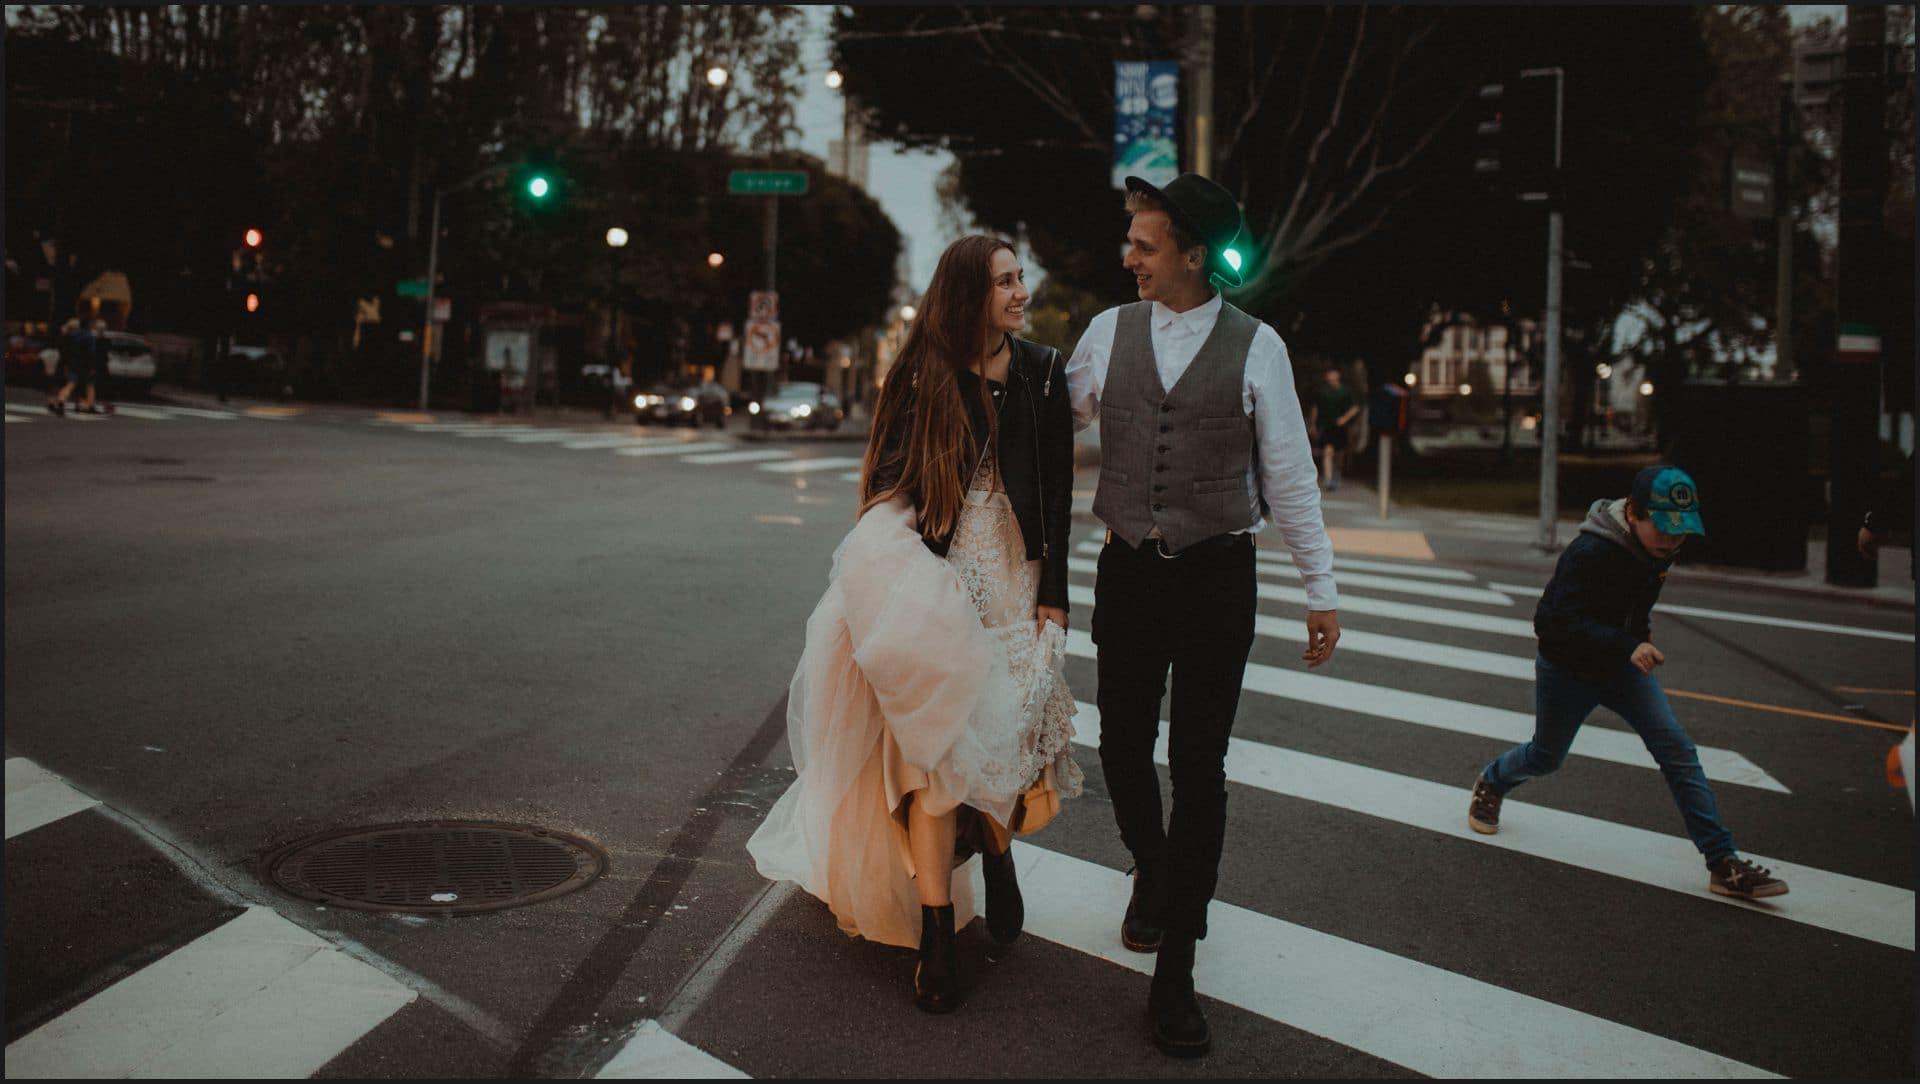 san francisco, california, elopement wedding, road, columbus street, bride, groom